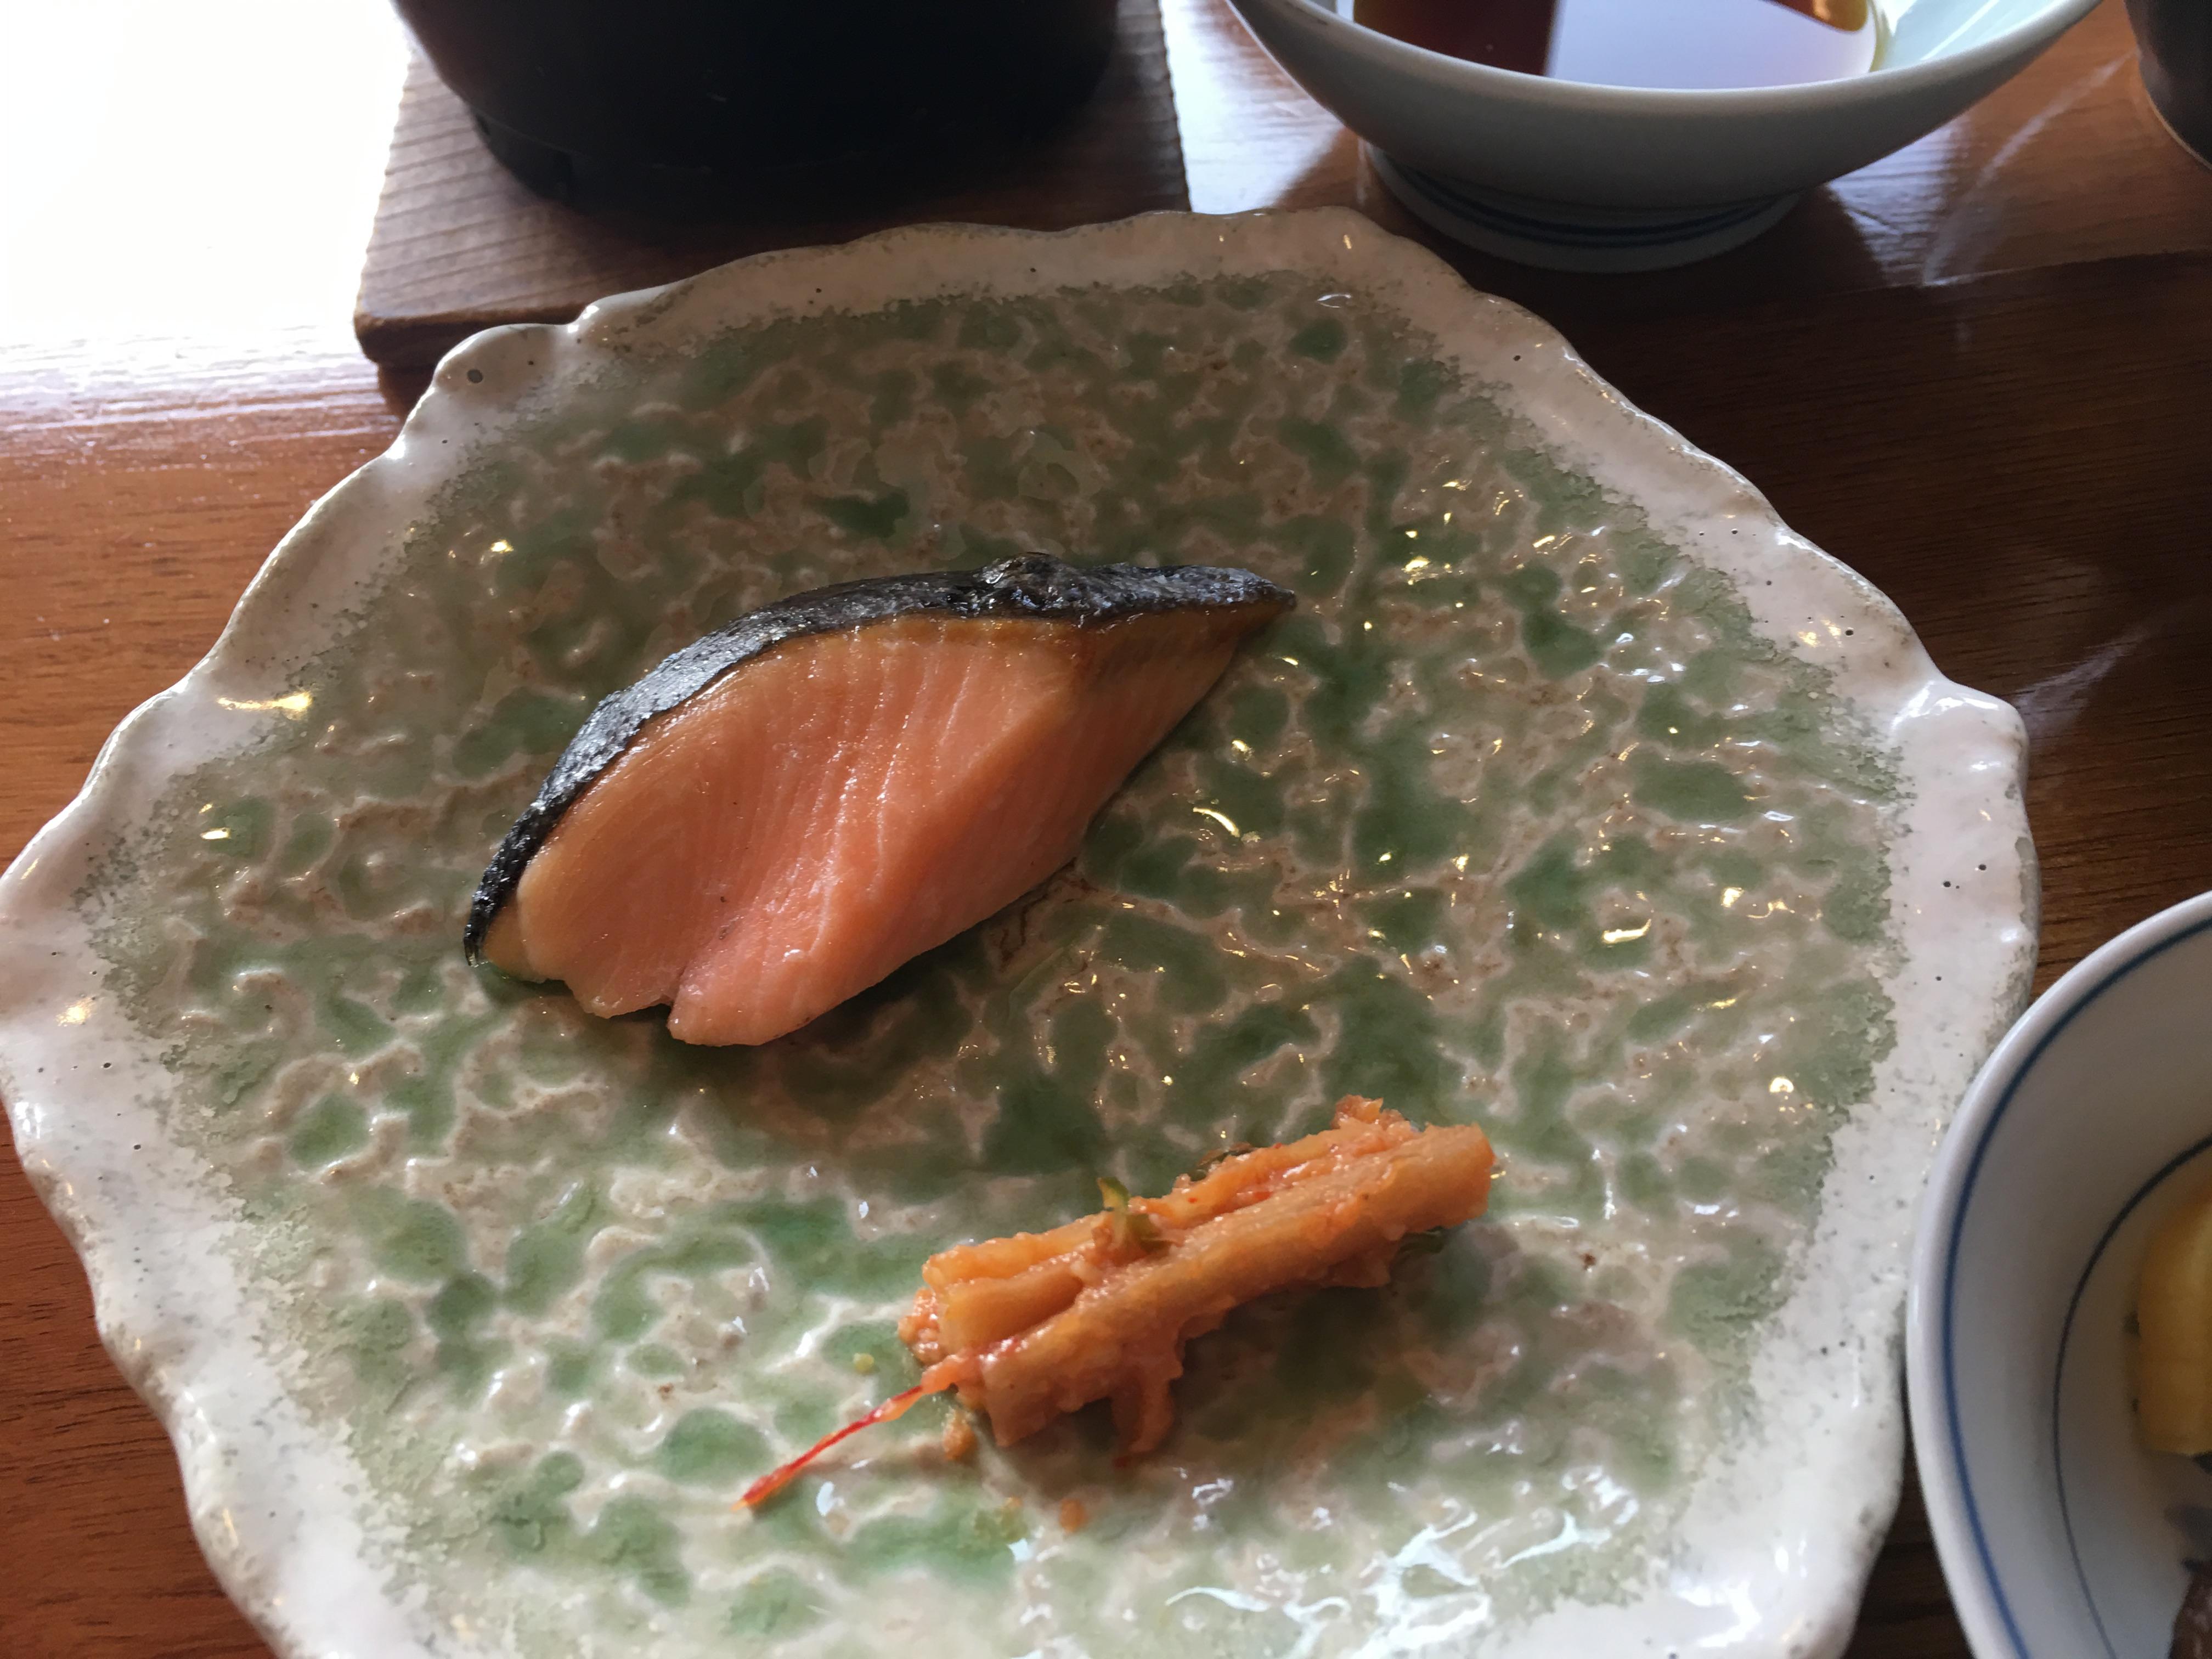 IMG_3297 福島 旅館ひげの家のお食事